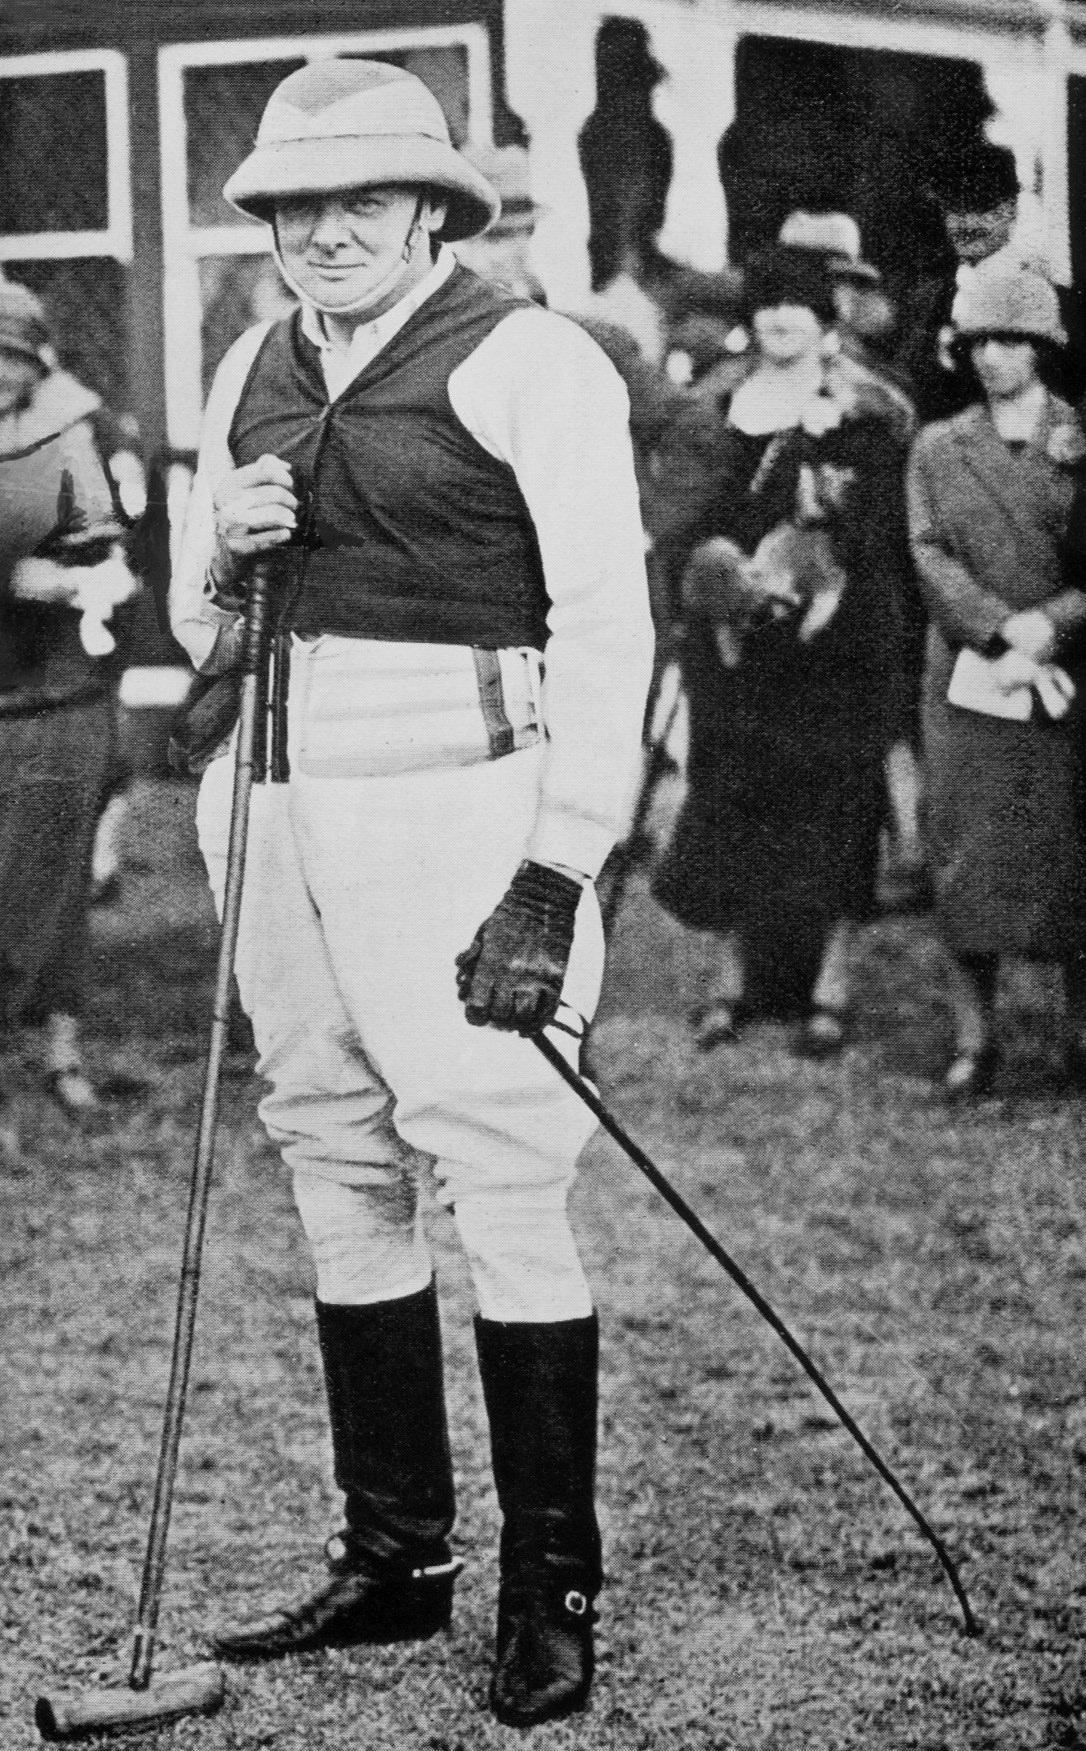 Winston Churchill - The Polo Player